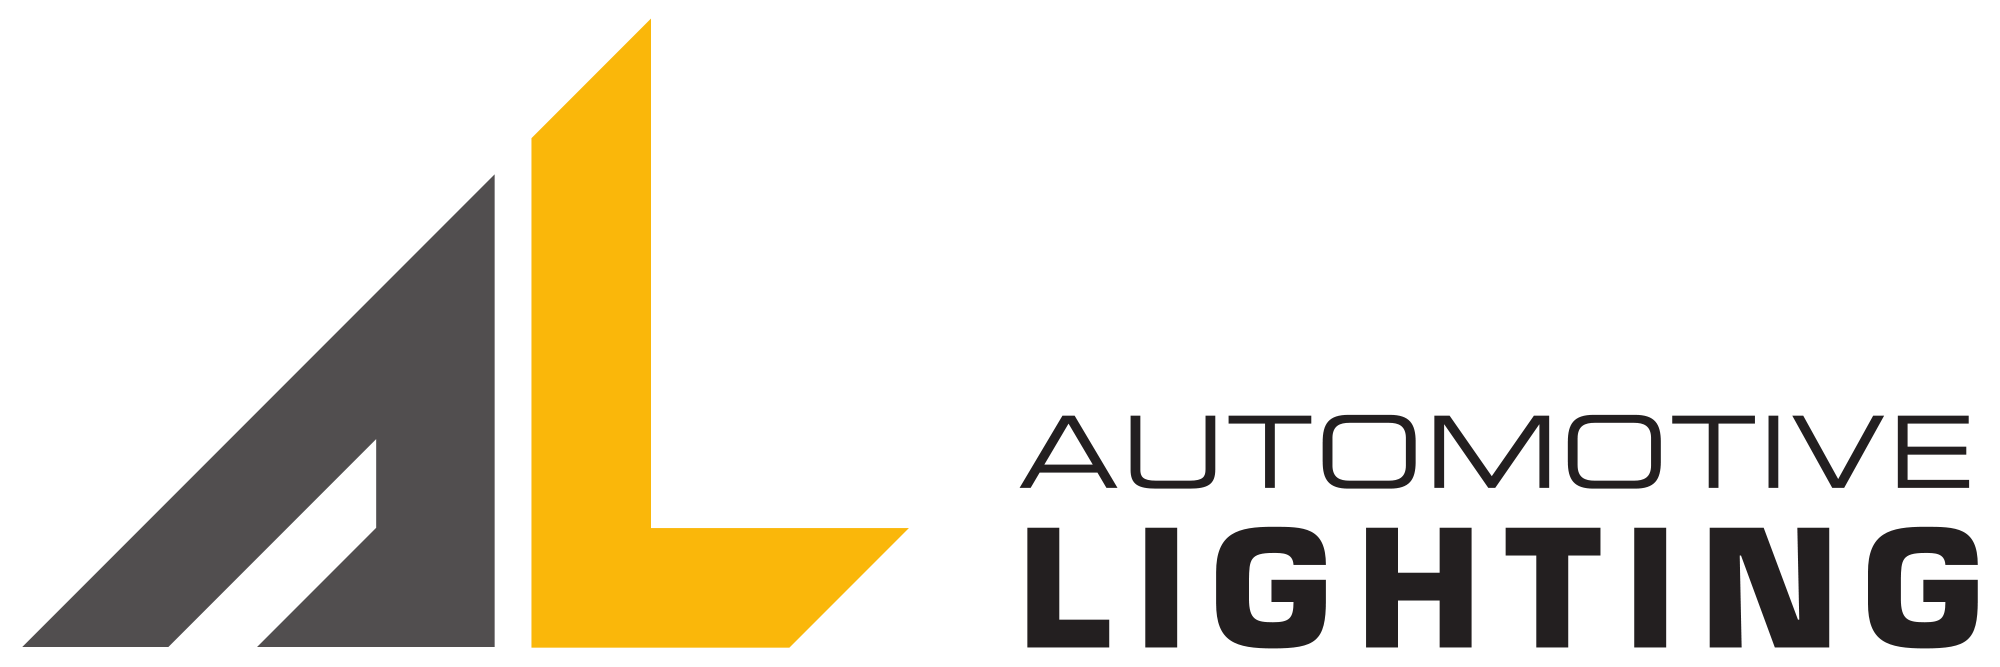 Automotive_lighting_logo